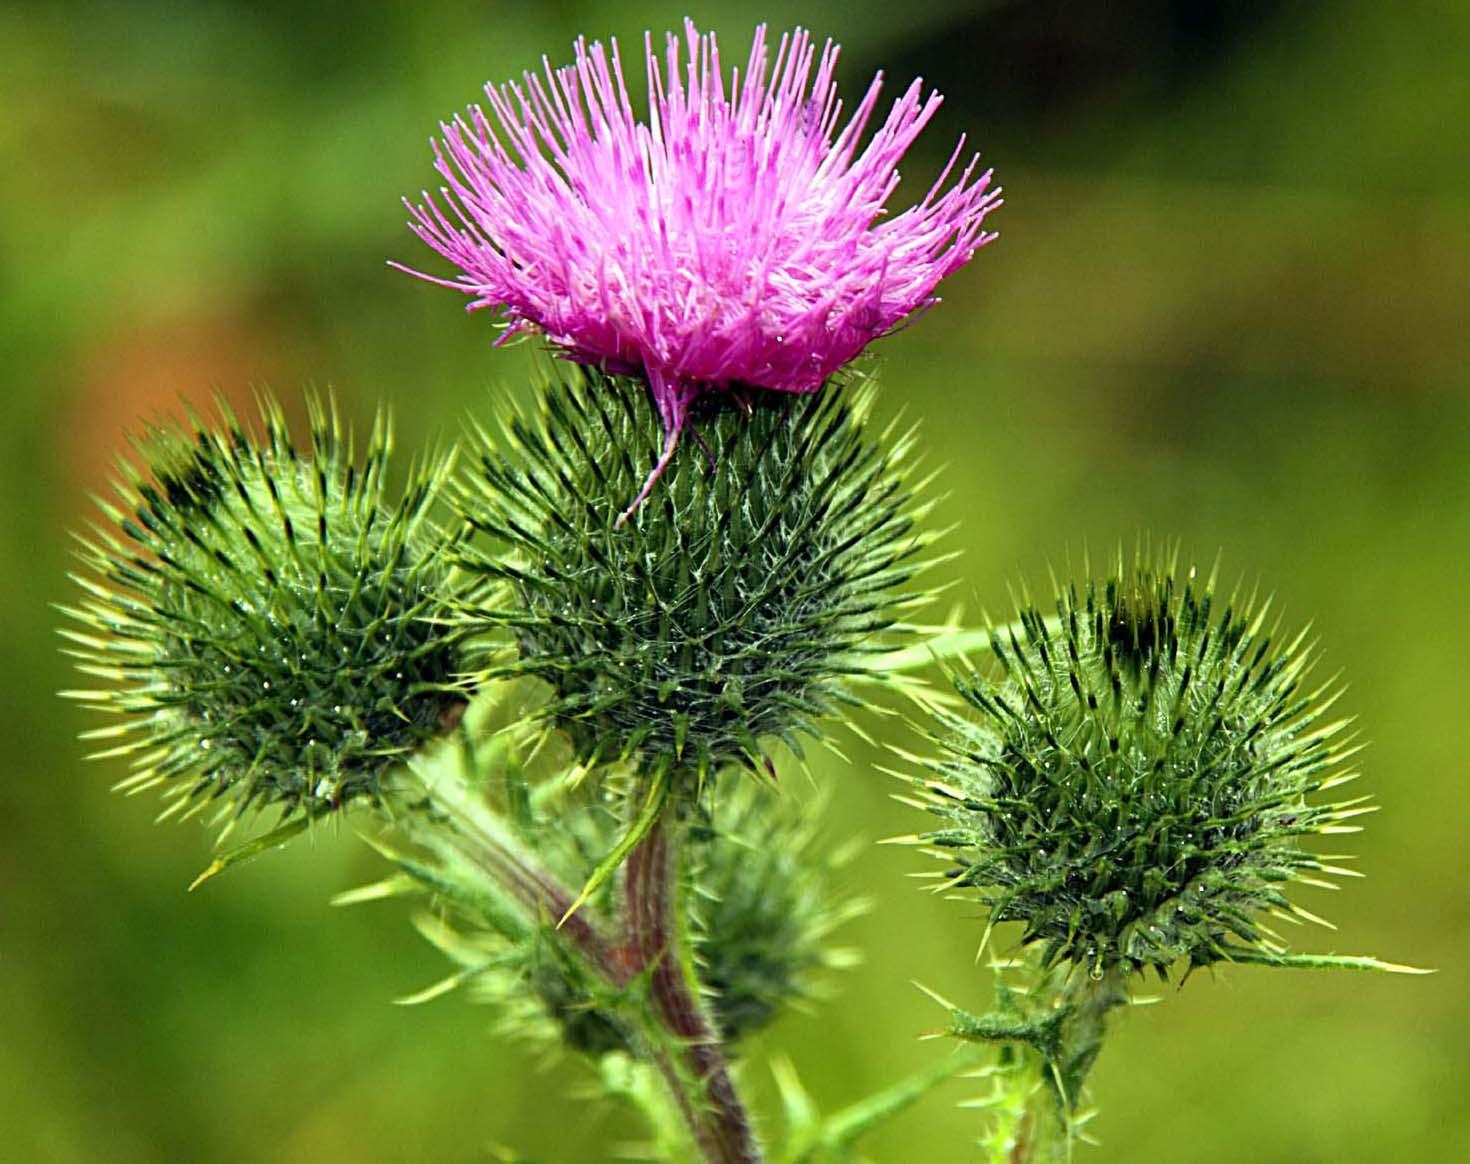 northwich,thistle,invasive,plants,weeds,scotland,flower,purple,sharp,365days,Schotland,l'Ecosse,Ecosse,Schottland,\u03a3\u03ba\u03c9\u03c4\u03af\u03b1,la,Scozia,\u30b9\u30b3\u30c3\u30c8\u30e9\u30f3\u30c9,\uc2a4\ucf54\ud2c0\ub780\ub4dc,\u0428\u043e\u0442\u043b\u0430\u043d\u0434\u0438\u044f,Escocia,nature,natural,history,world,life,this photo rocks,plant,bloom,flowers,flores,blome,edinbrugh,NaturesElegantShots,flickrflorescloseupmacros,mimamorflowers,flickrsportal,flowersarebeautiful,PhotosAndCalendar,FloraandFaunaofTgeWorld,MixofFlowers,ExquisiteFlowers,hotpix!